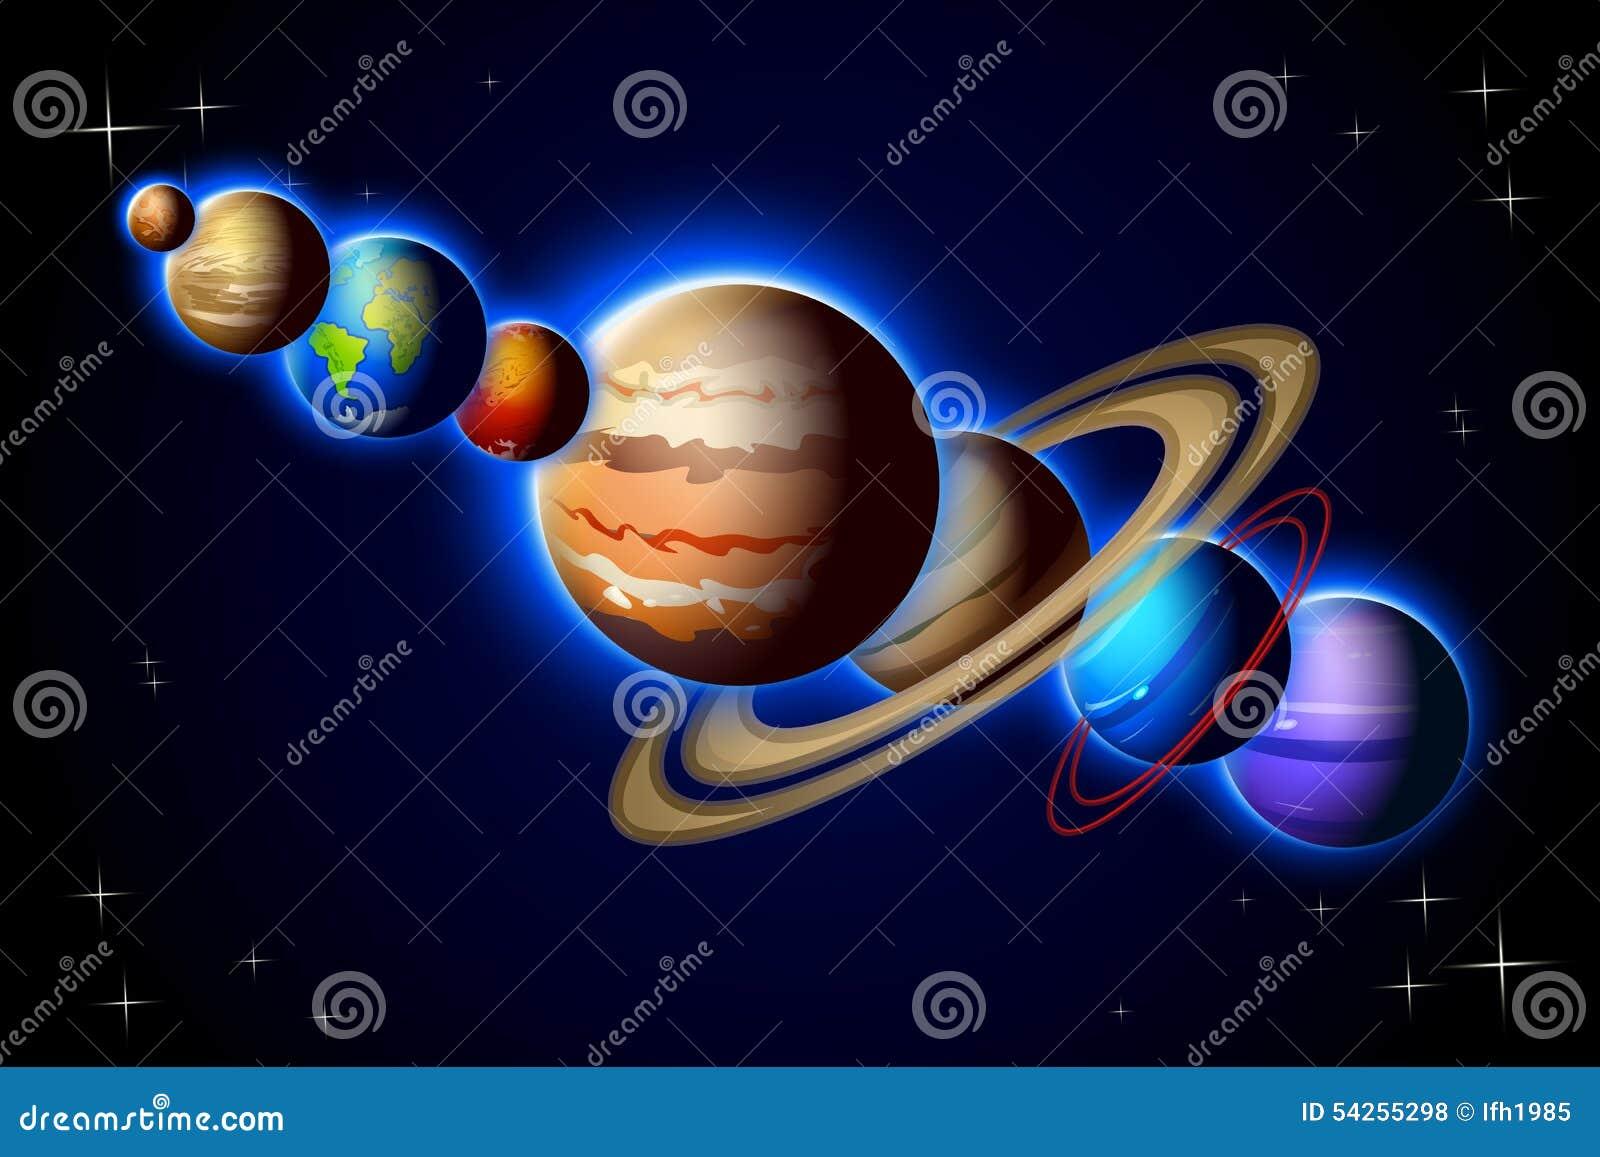 for solar system orbit lines - photo #38